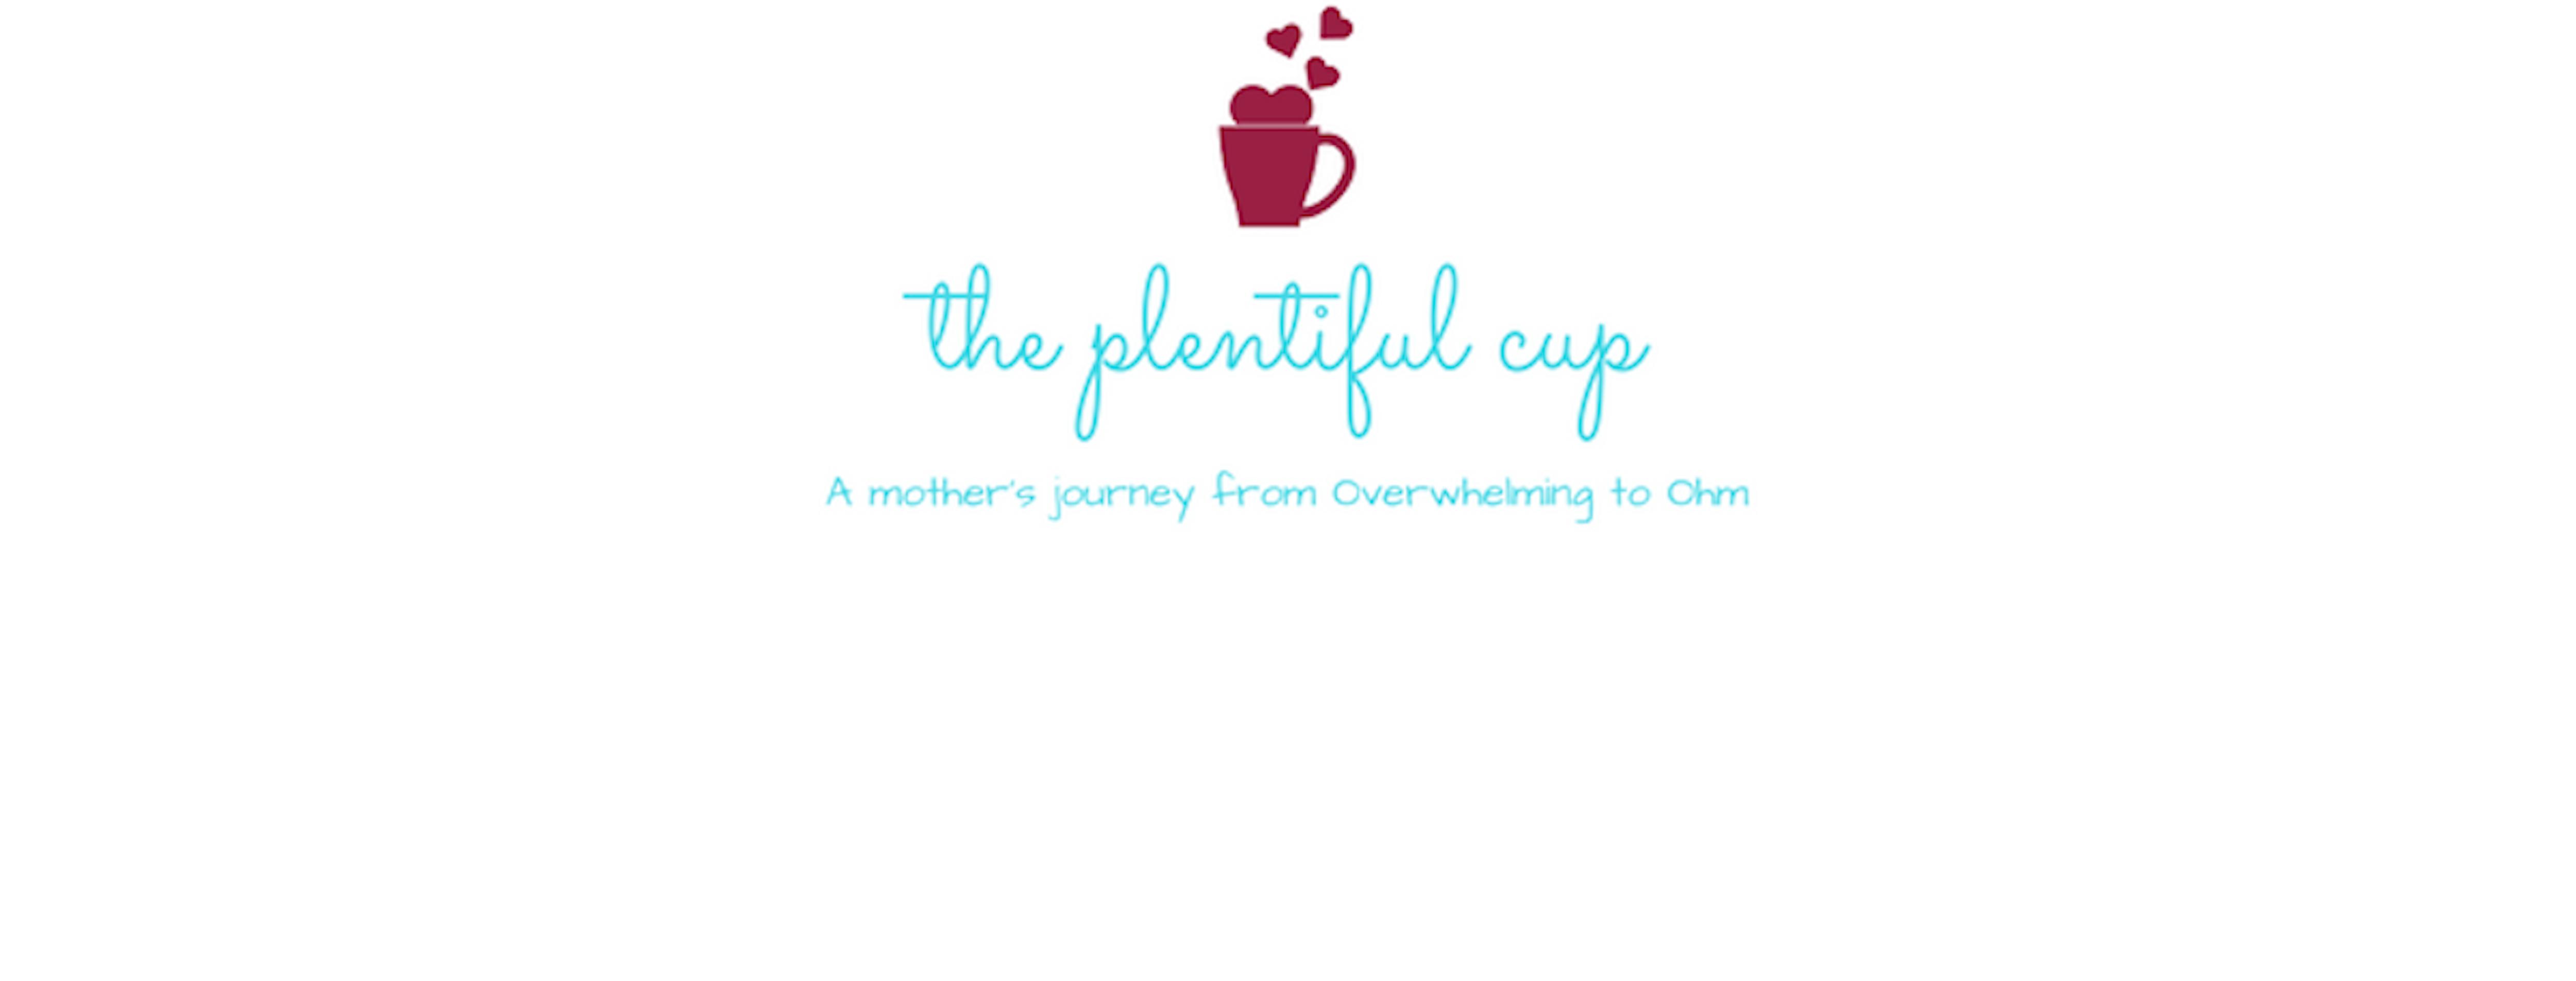 The plentiful cup facebook cover  no transp